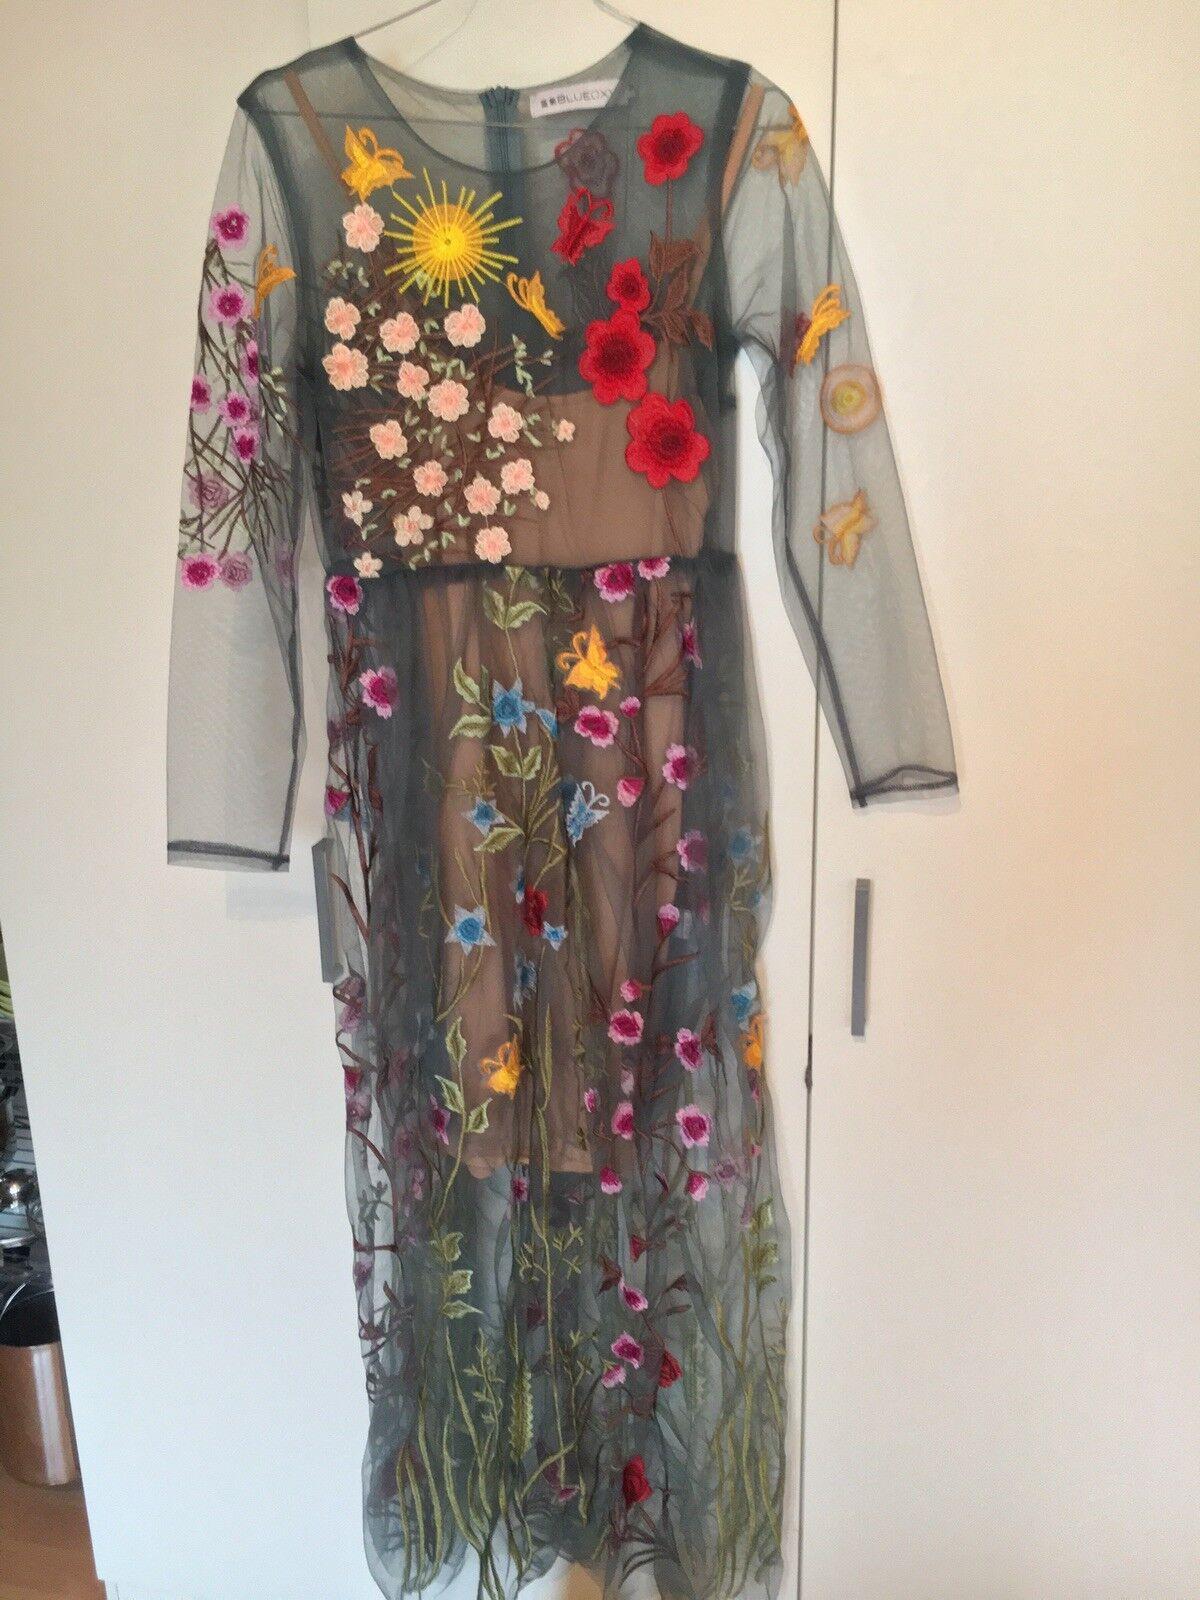 Tolles Besticktes Kleid Gr 34-36